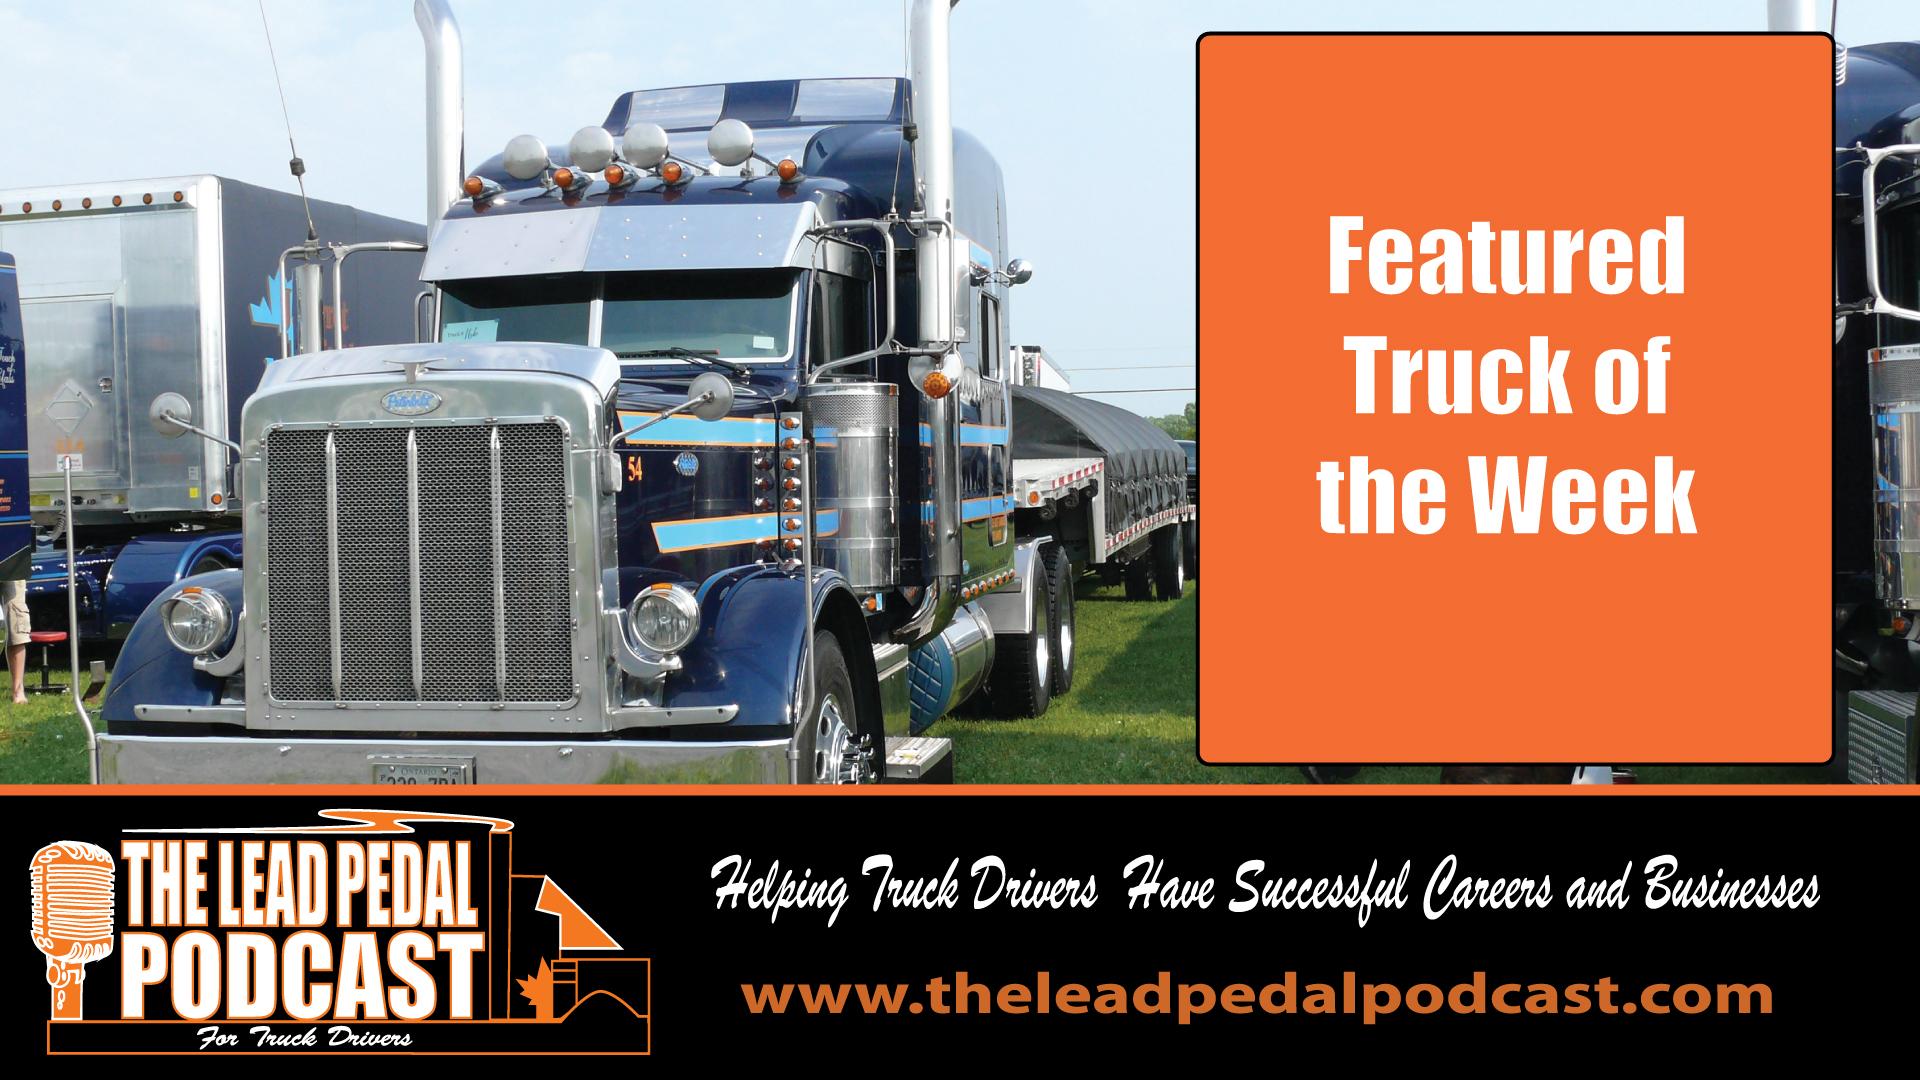 Featured Trucks of the Week - Syvret Trucks